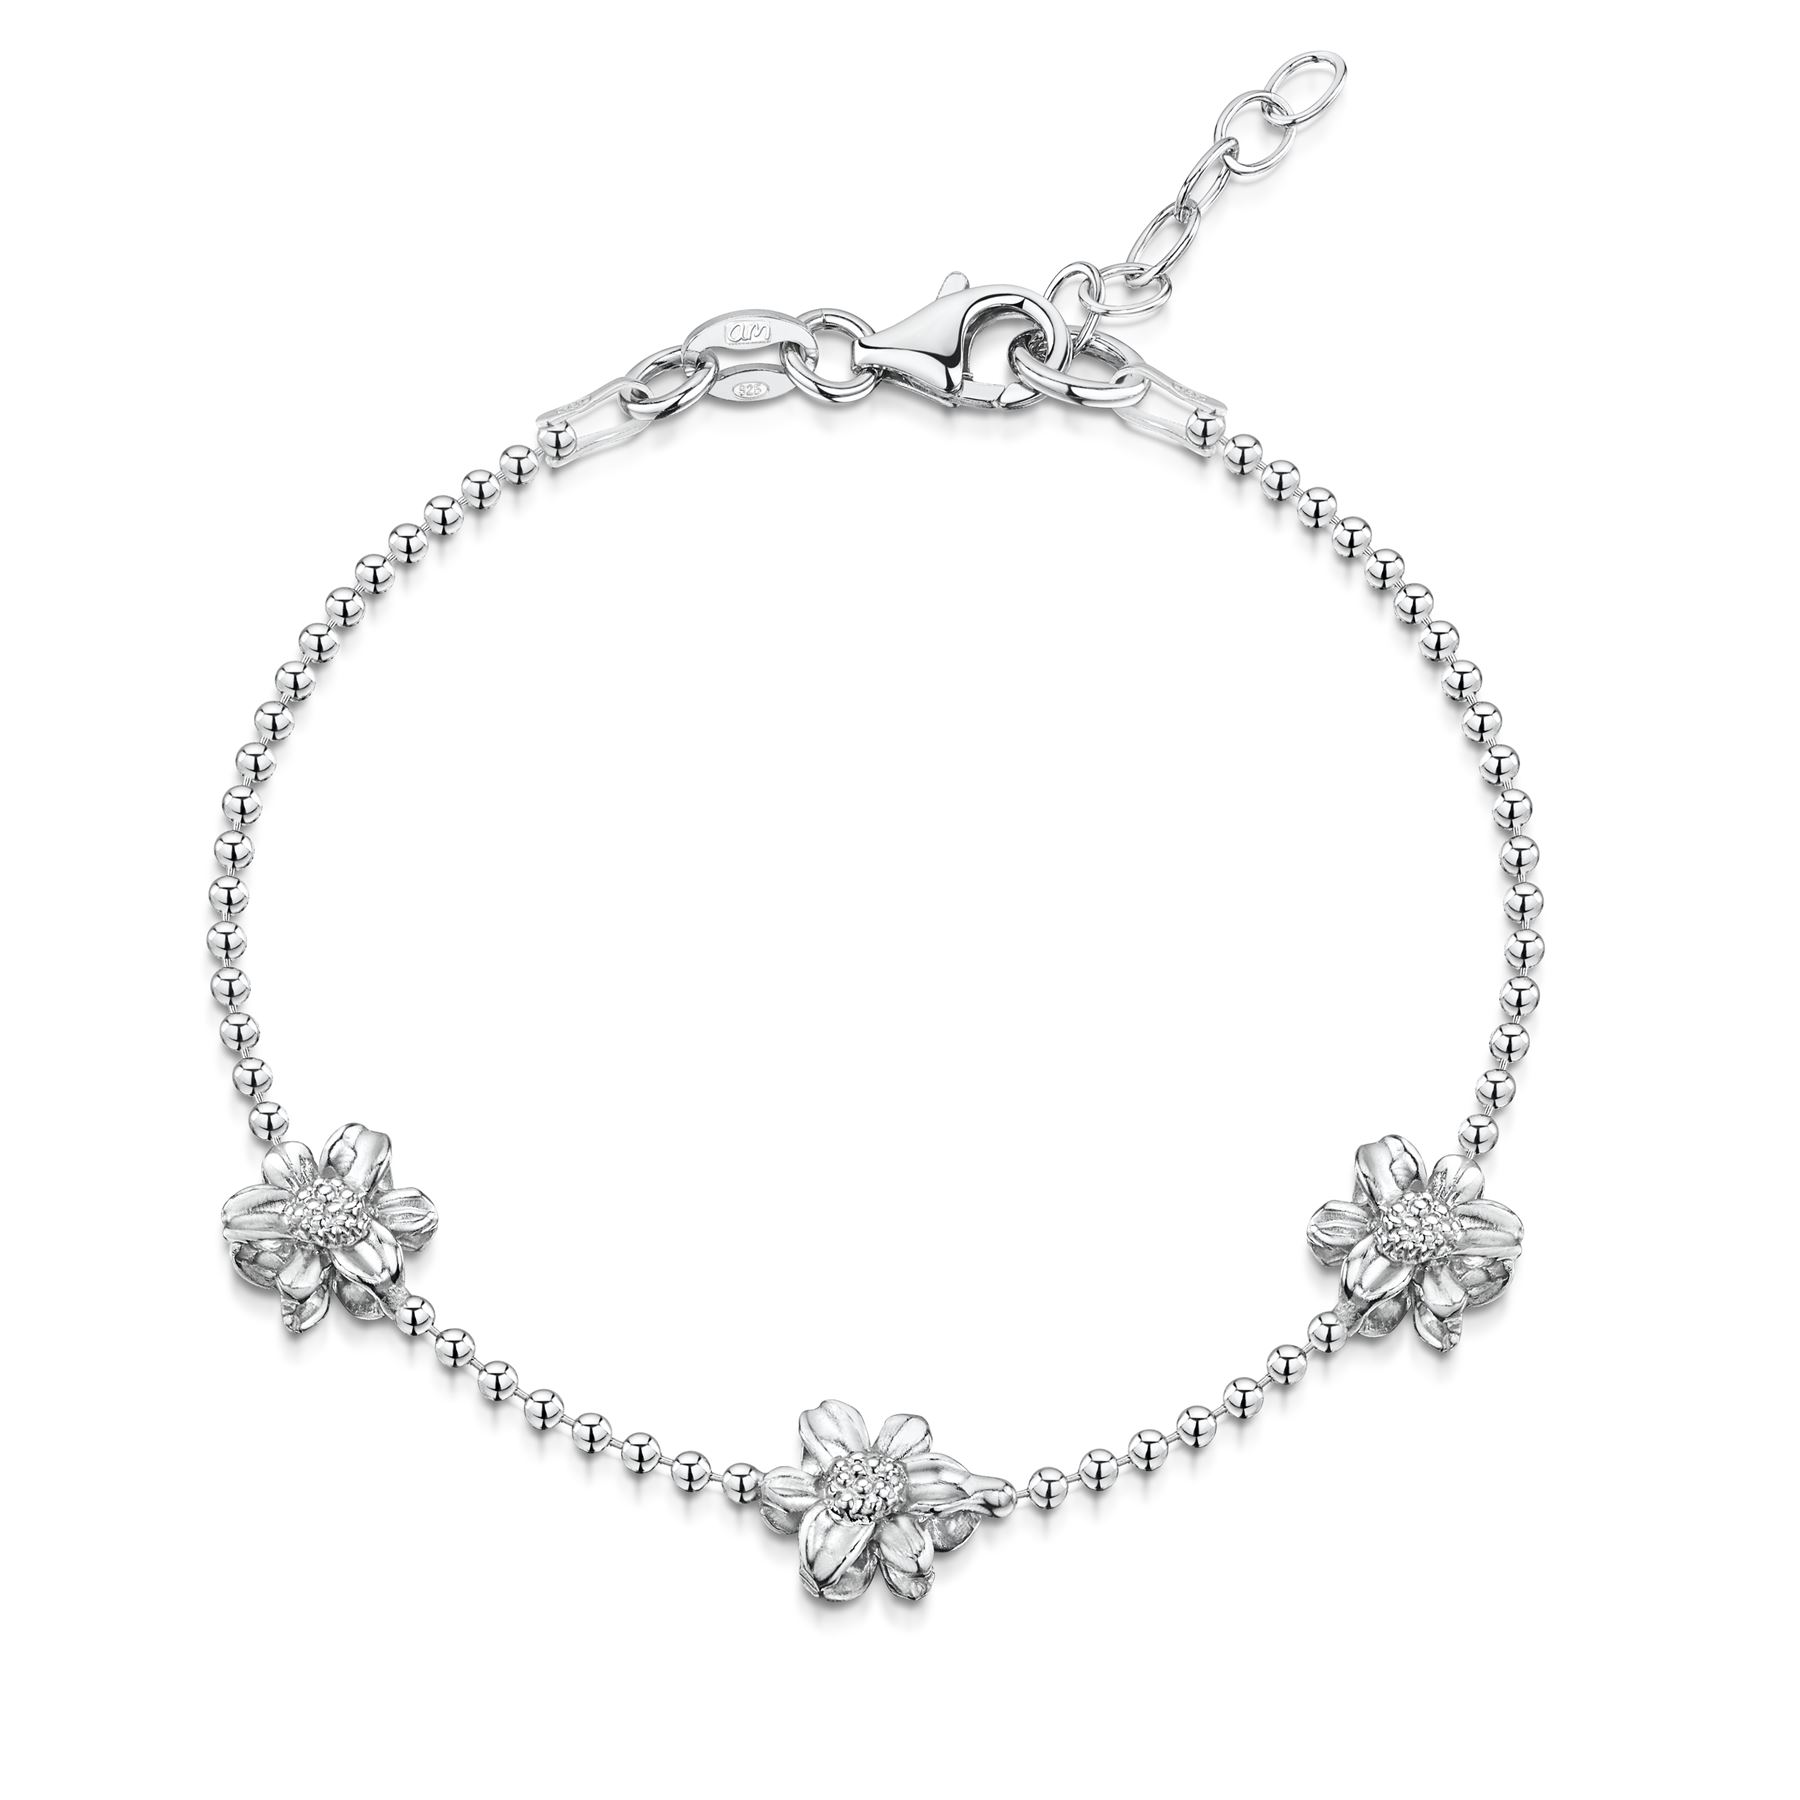 Amberta-Jewelry-925-Sterling-Silver-Adjustable-Bracelet-Italian-Bangle-for-Women thumbnail 44